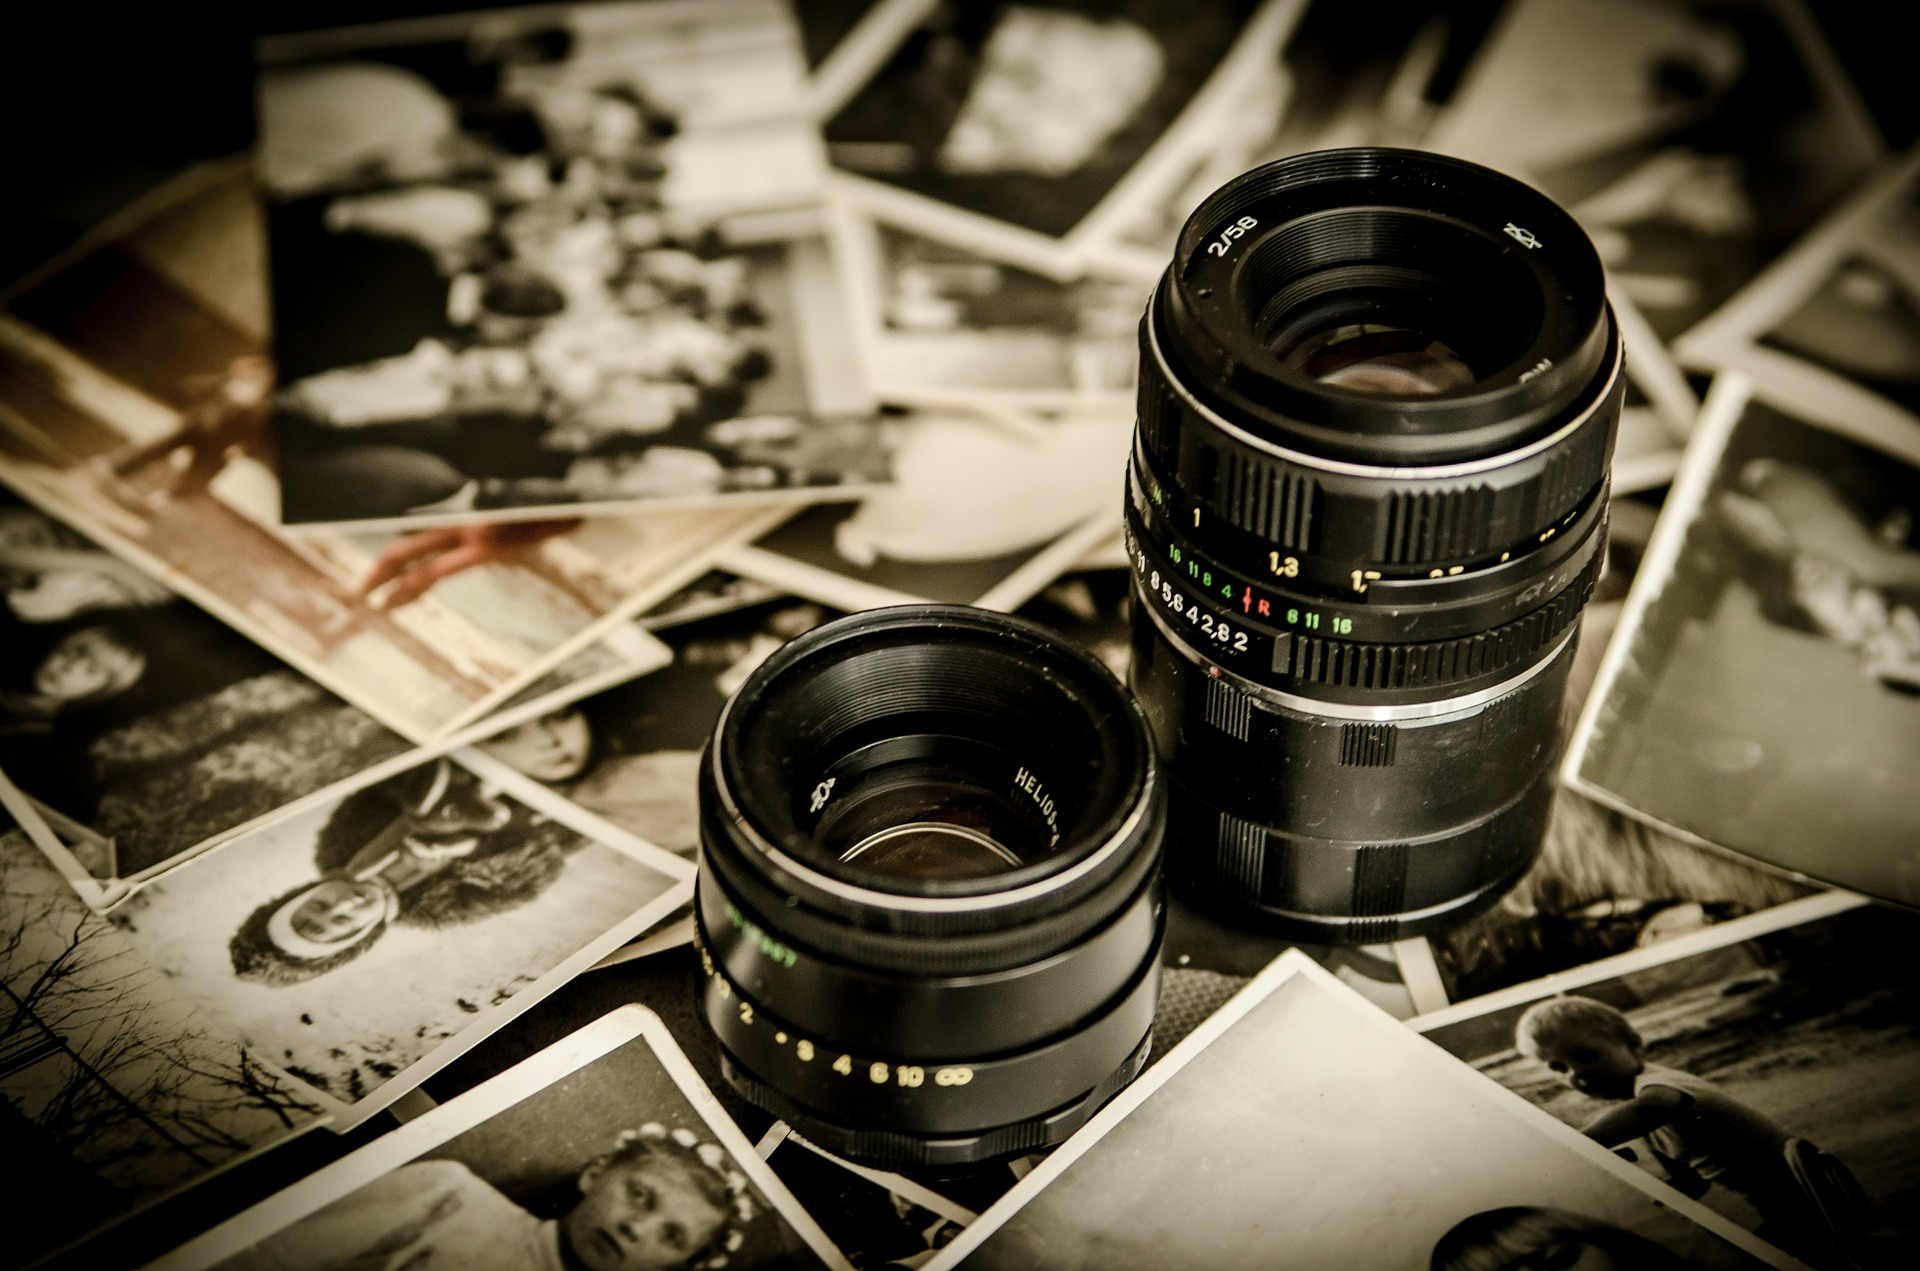 photographs-256888-1920.jpg